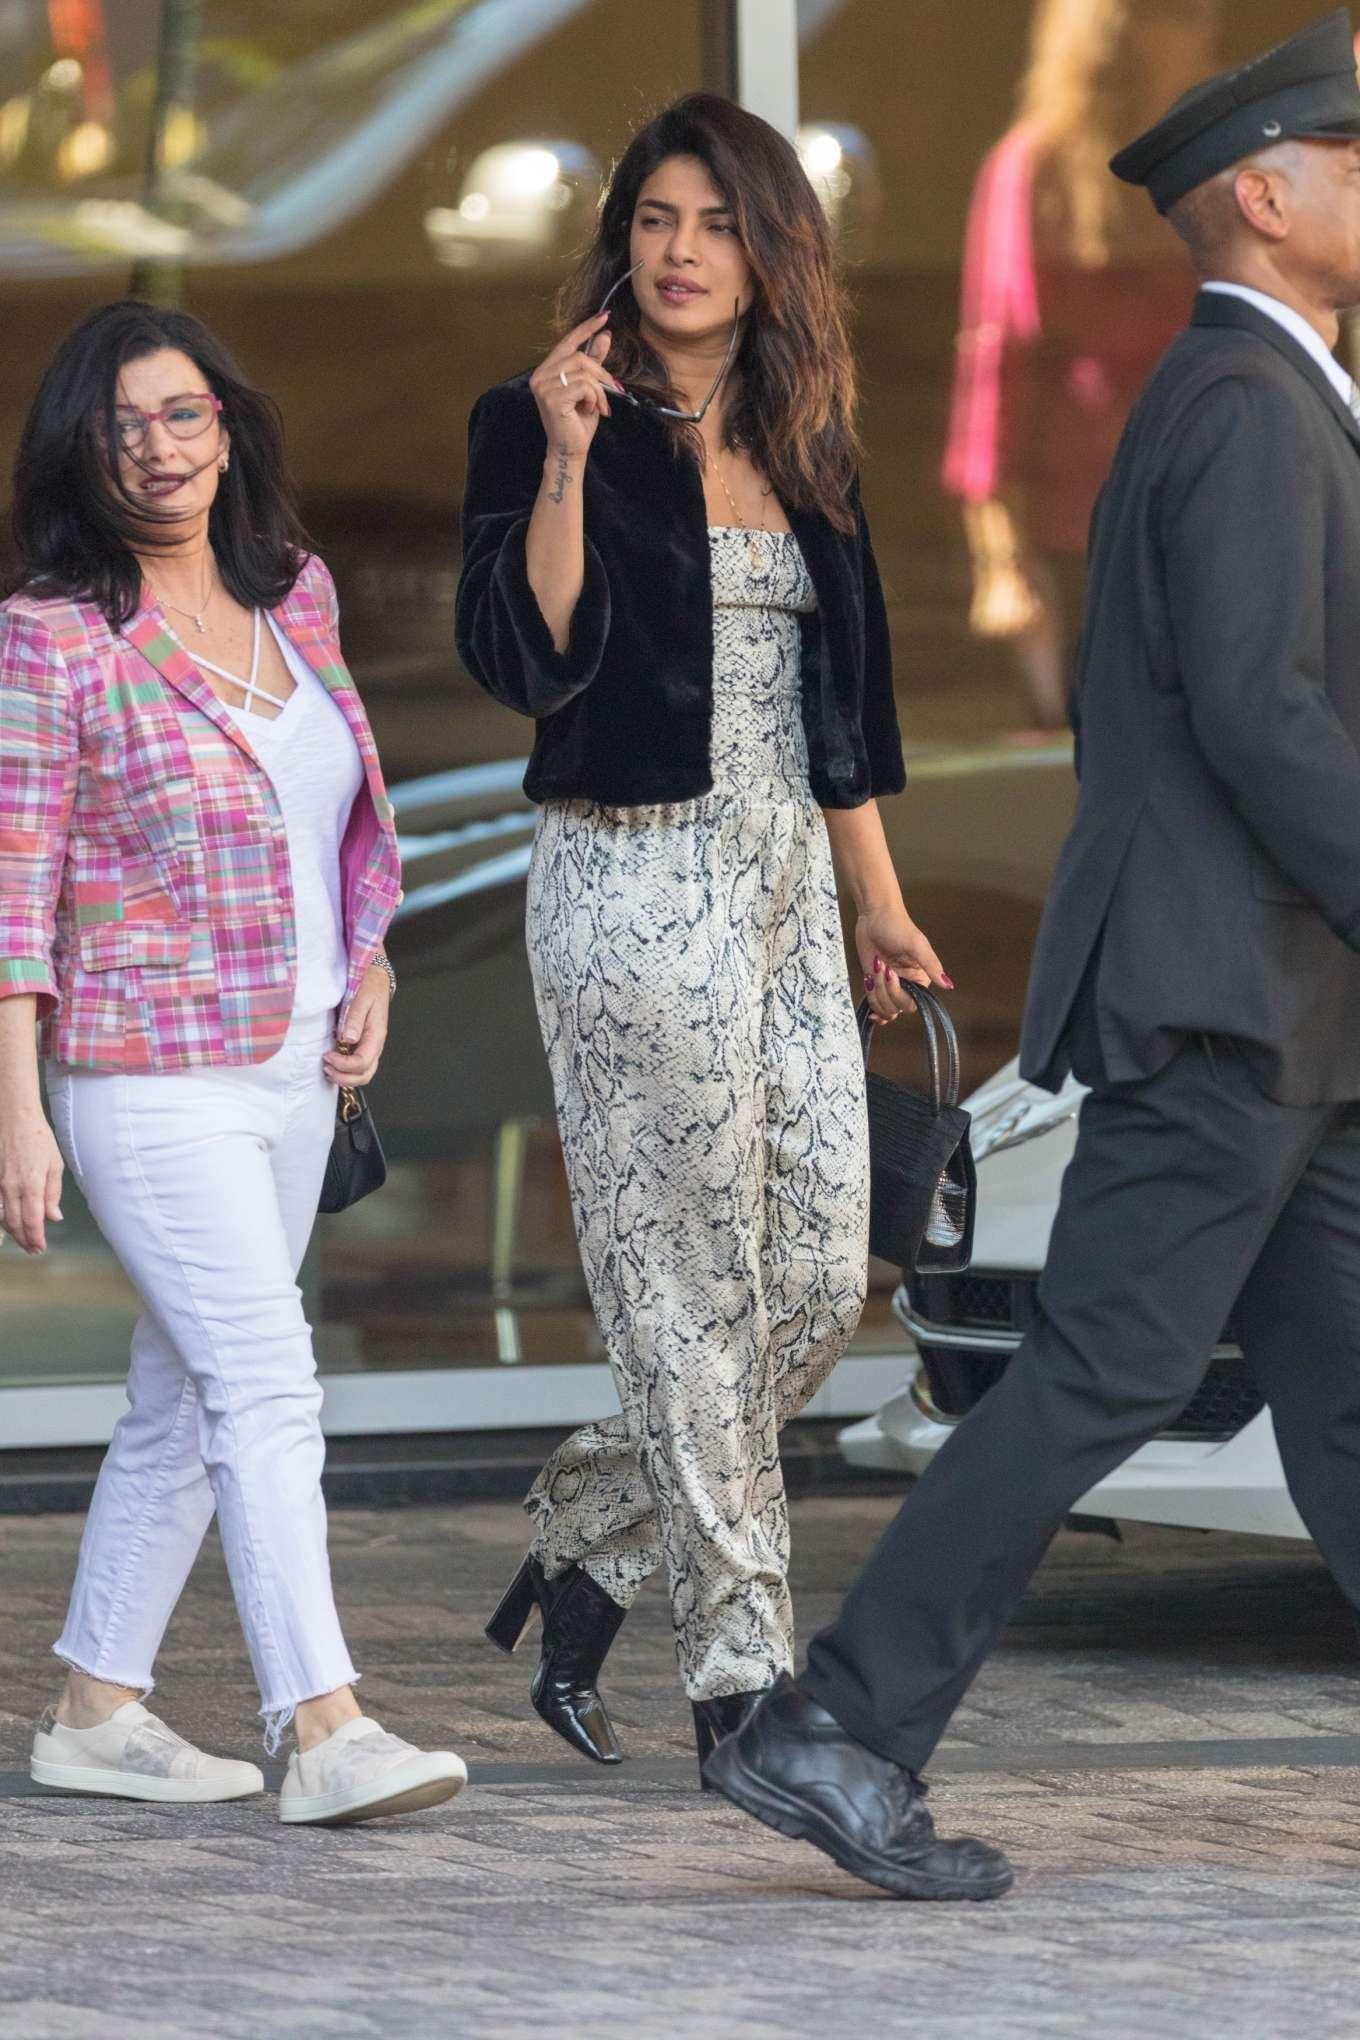 Priyanka Chopra 2019 : Priyanka Chopra: Head out to dinner in Atlanta -04